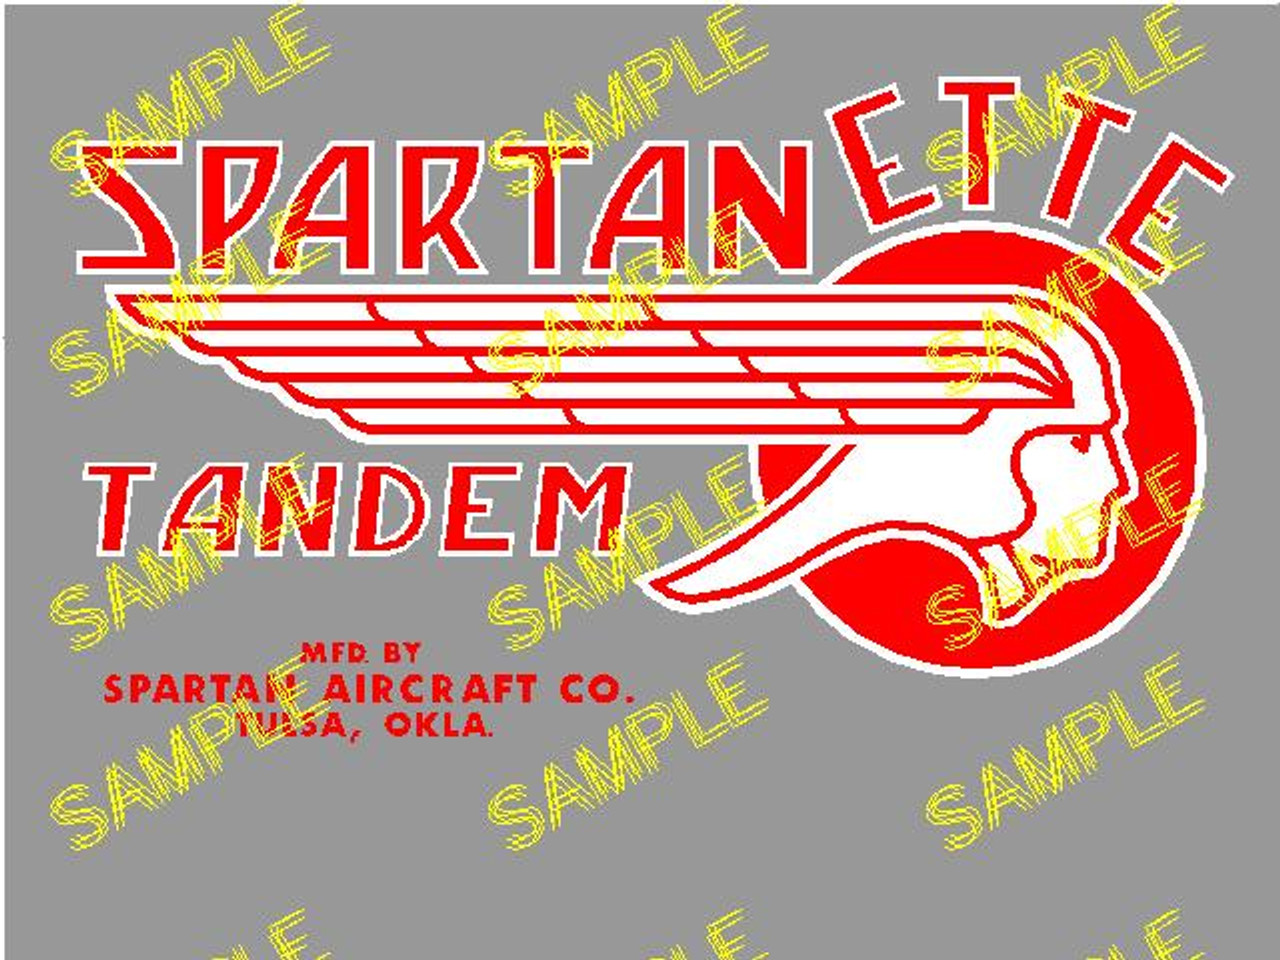 Spartanette Tandem Decal (CHW114)